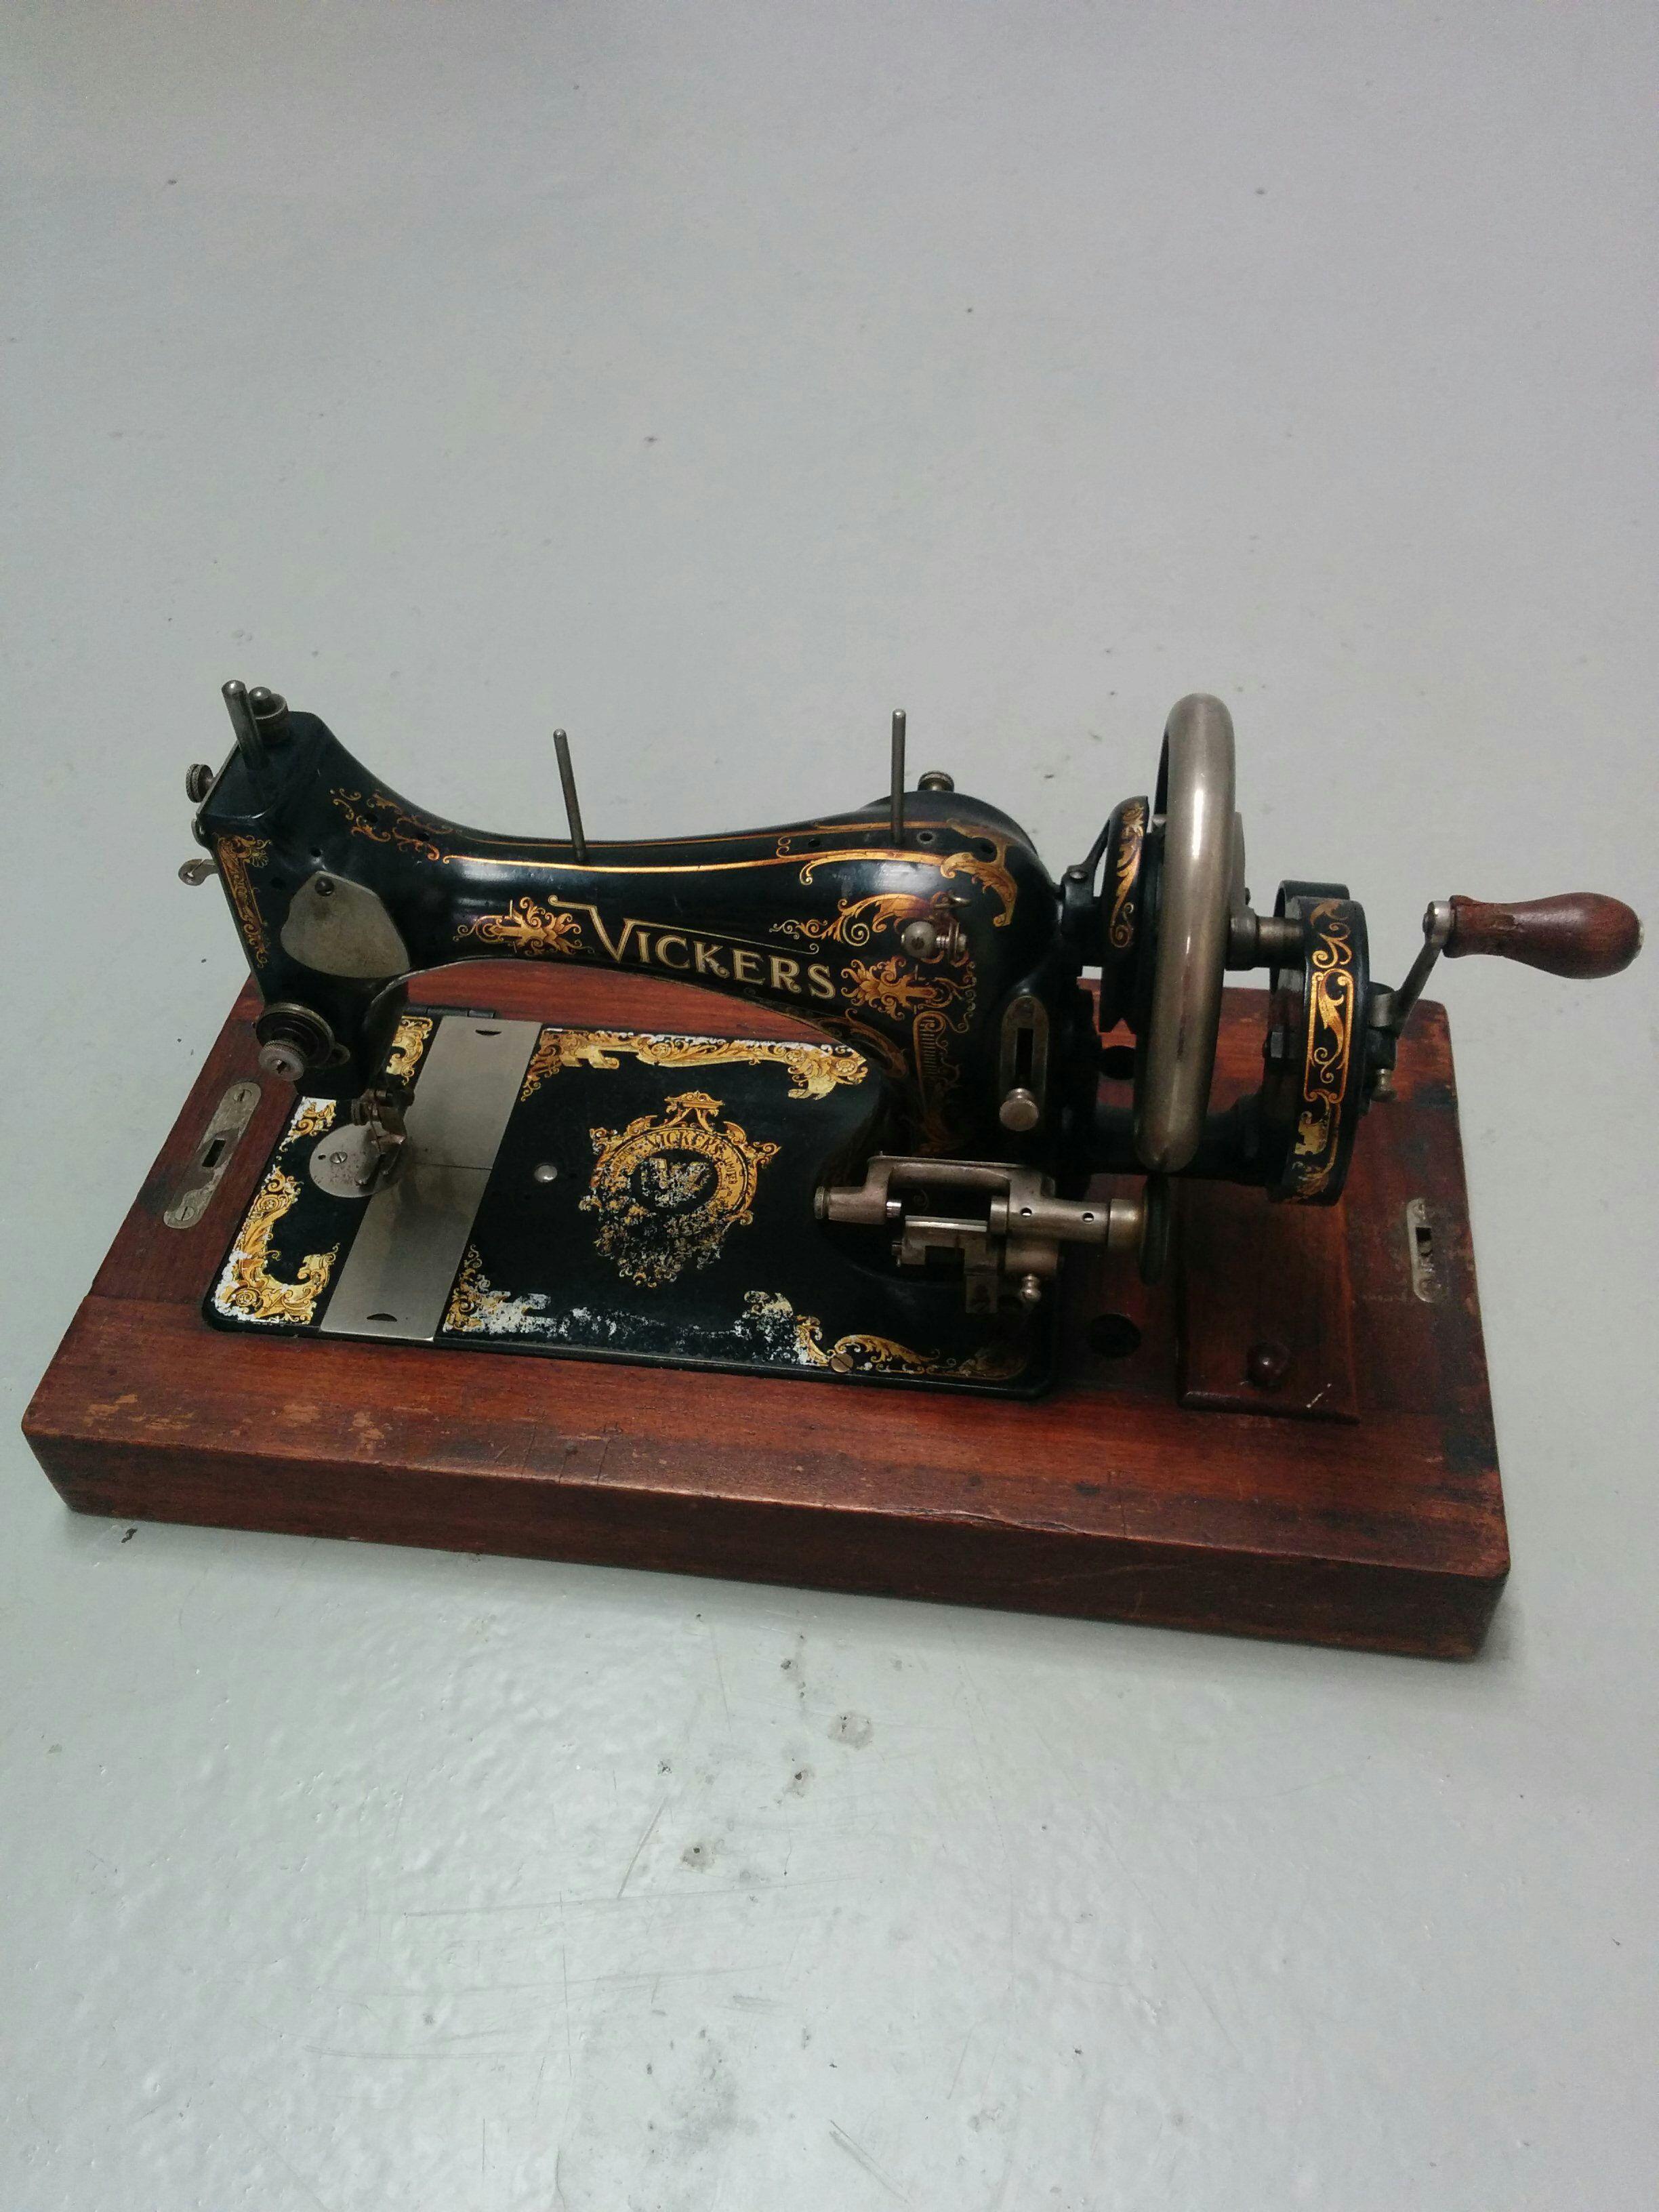 Vickers Modele de Luxe Antique sewing machine Vintage